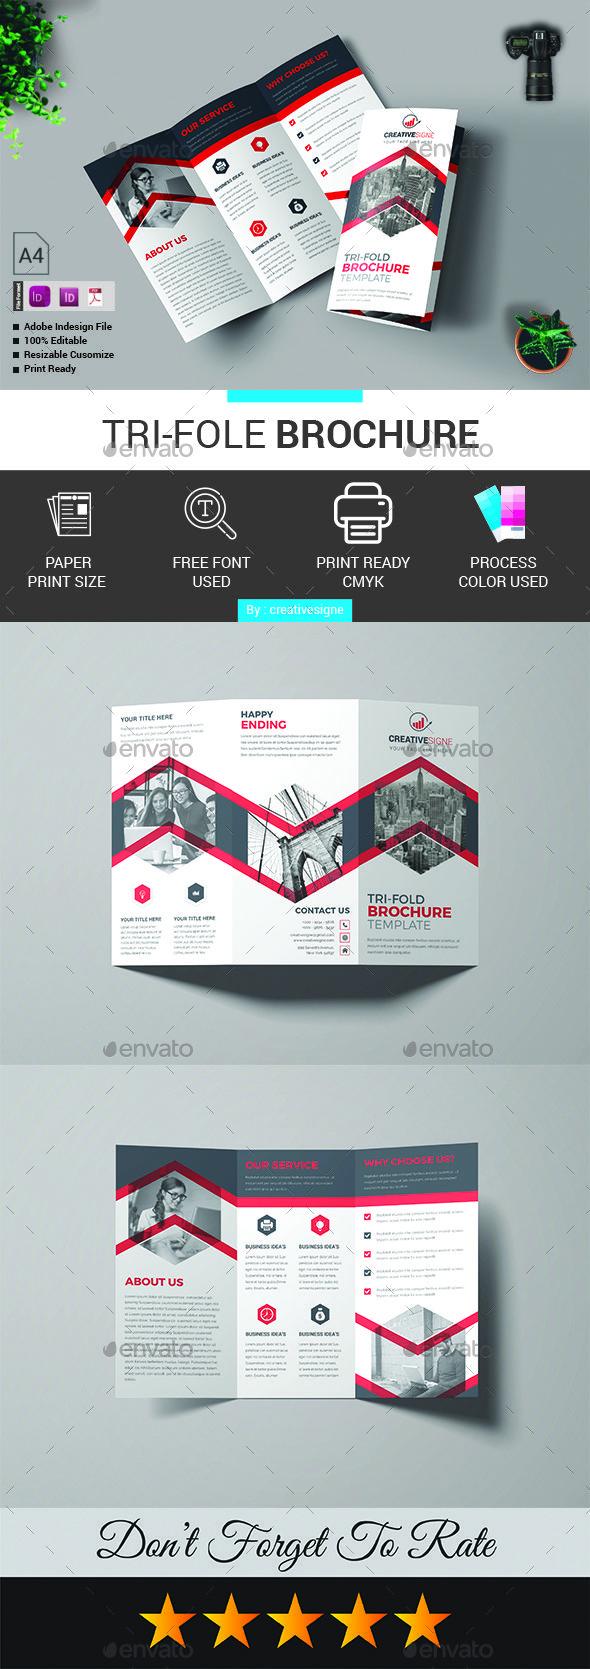 Ti-fold Brochure. Fully customizable professional template for a brochure. #BrochureTemplate #brochure #GraphicTemplate #design #PrintDesign #diagonal #letter #marketing #media #PrintBrochure #PrintReady #pro #professional #red #SquareTri-fold #studio #swiss #SwissStyle #Ti-foldBrochure #TriFold #UsLetter #web